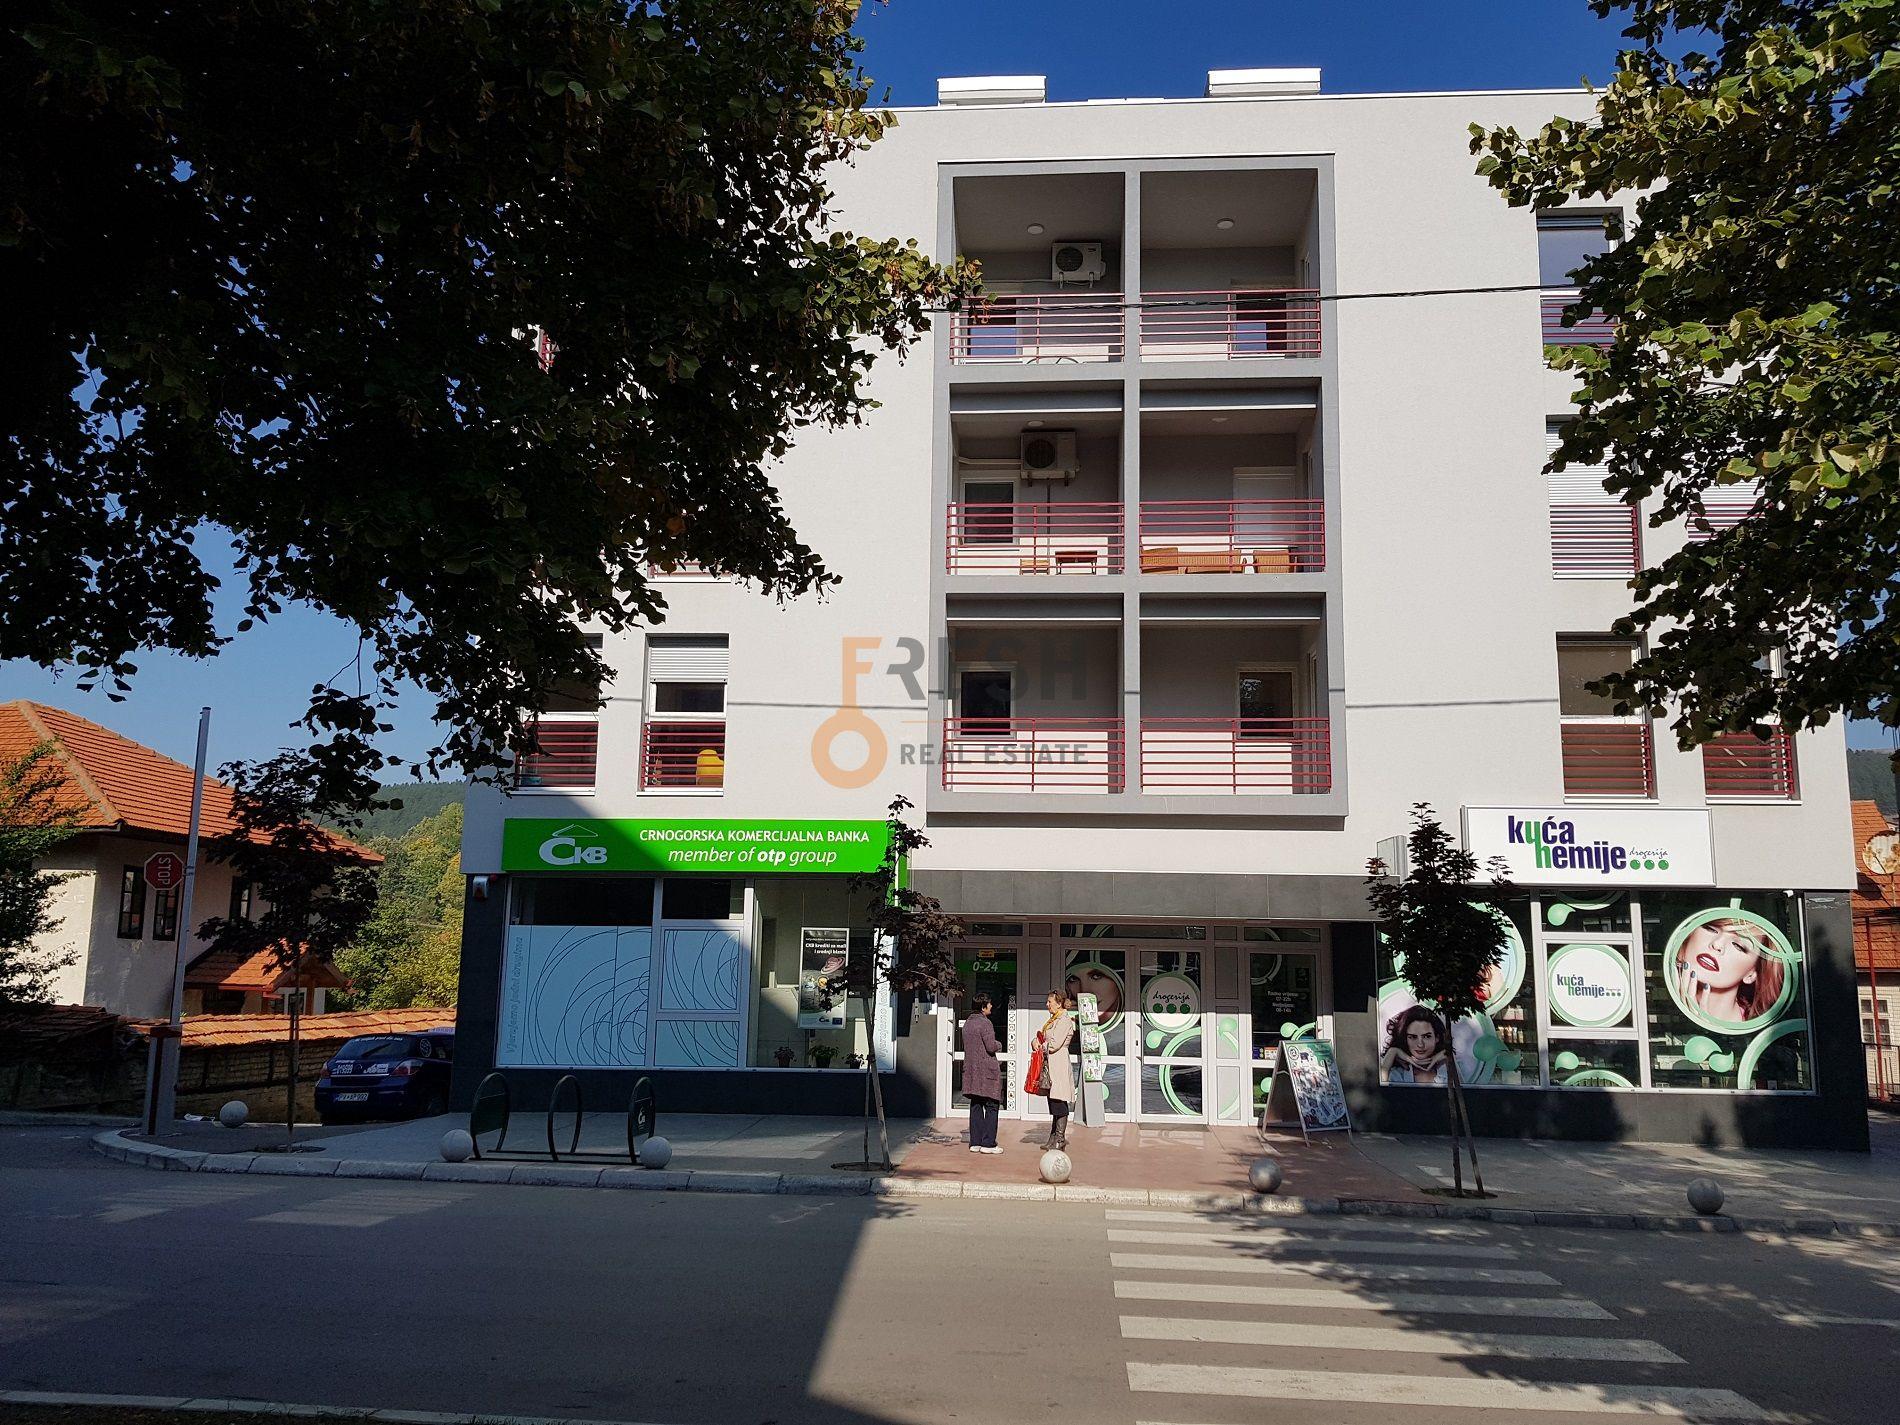 Jednosoban stan, 35m2, Centar, Pljevlja, prodaja - 1